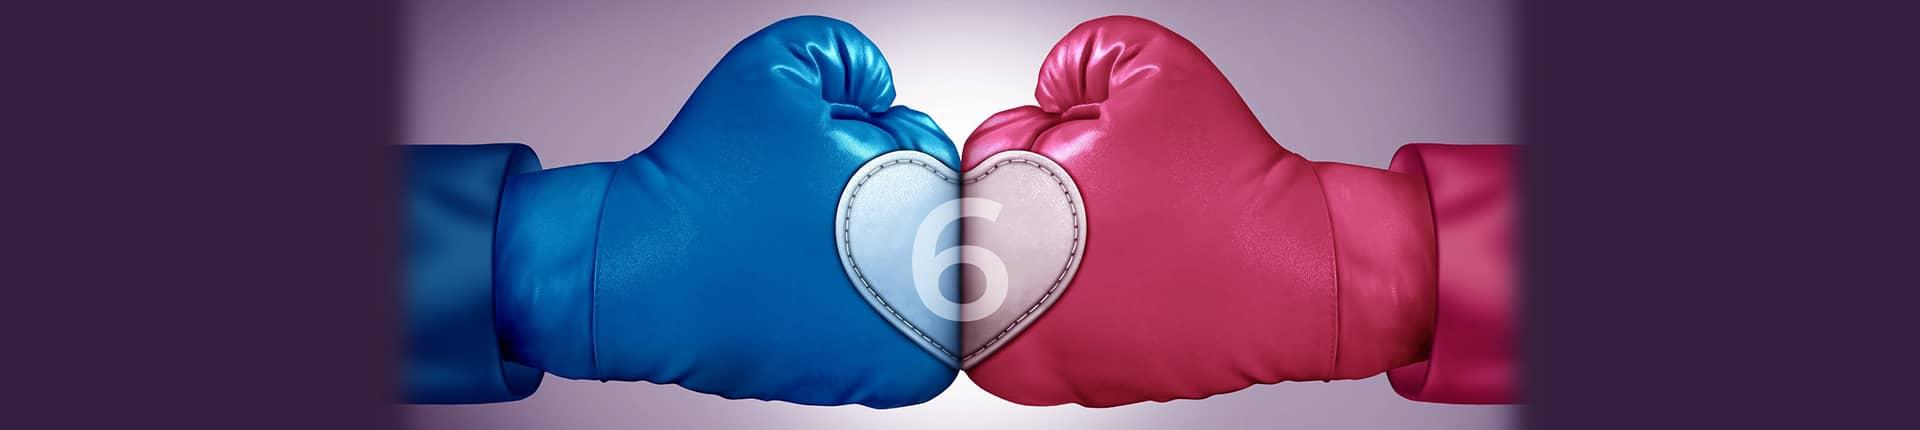 6 Top Reasons to Mediate Your Divorce